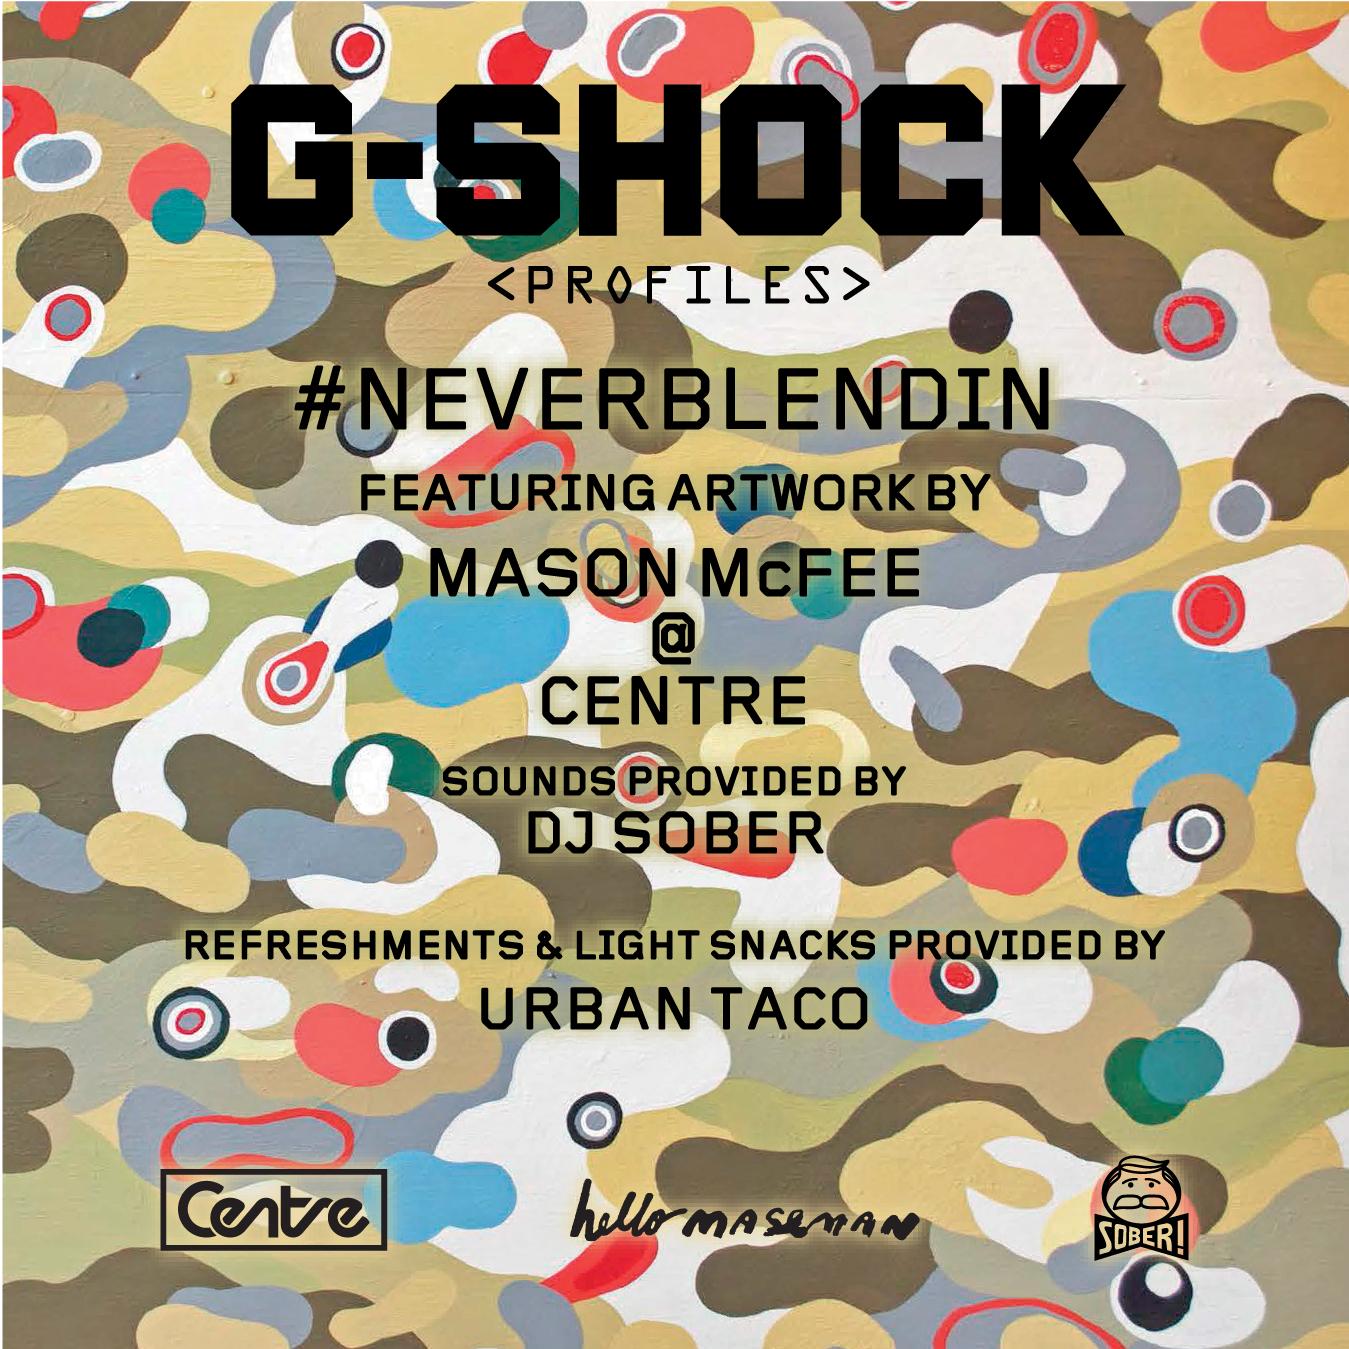 gshock-profiles-austin-invite-02[1]